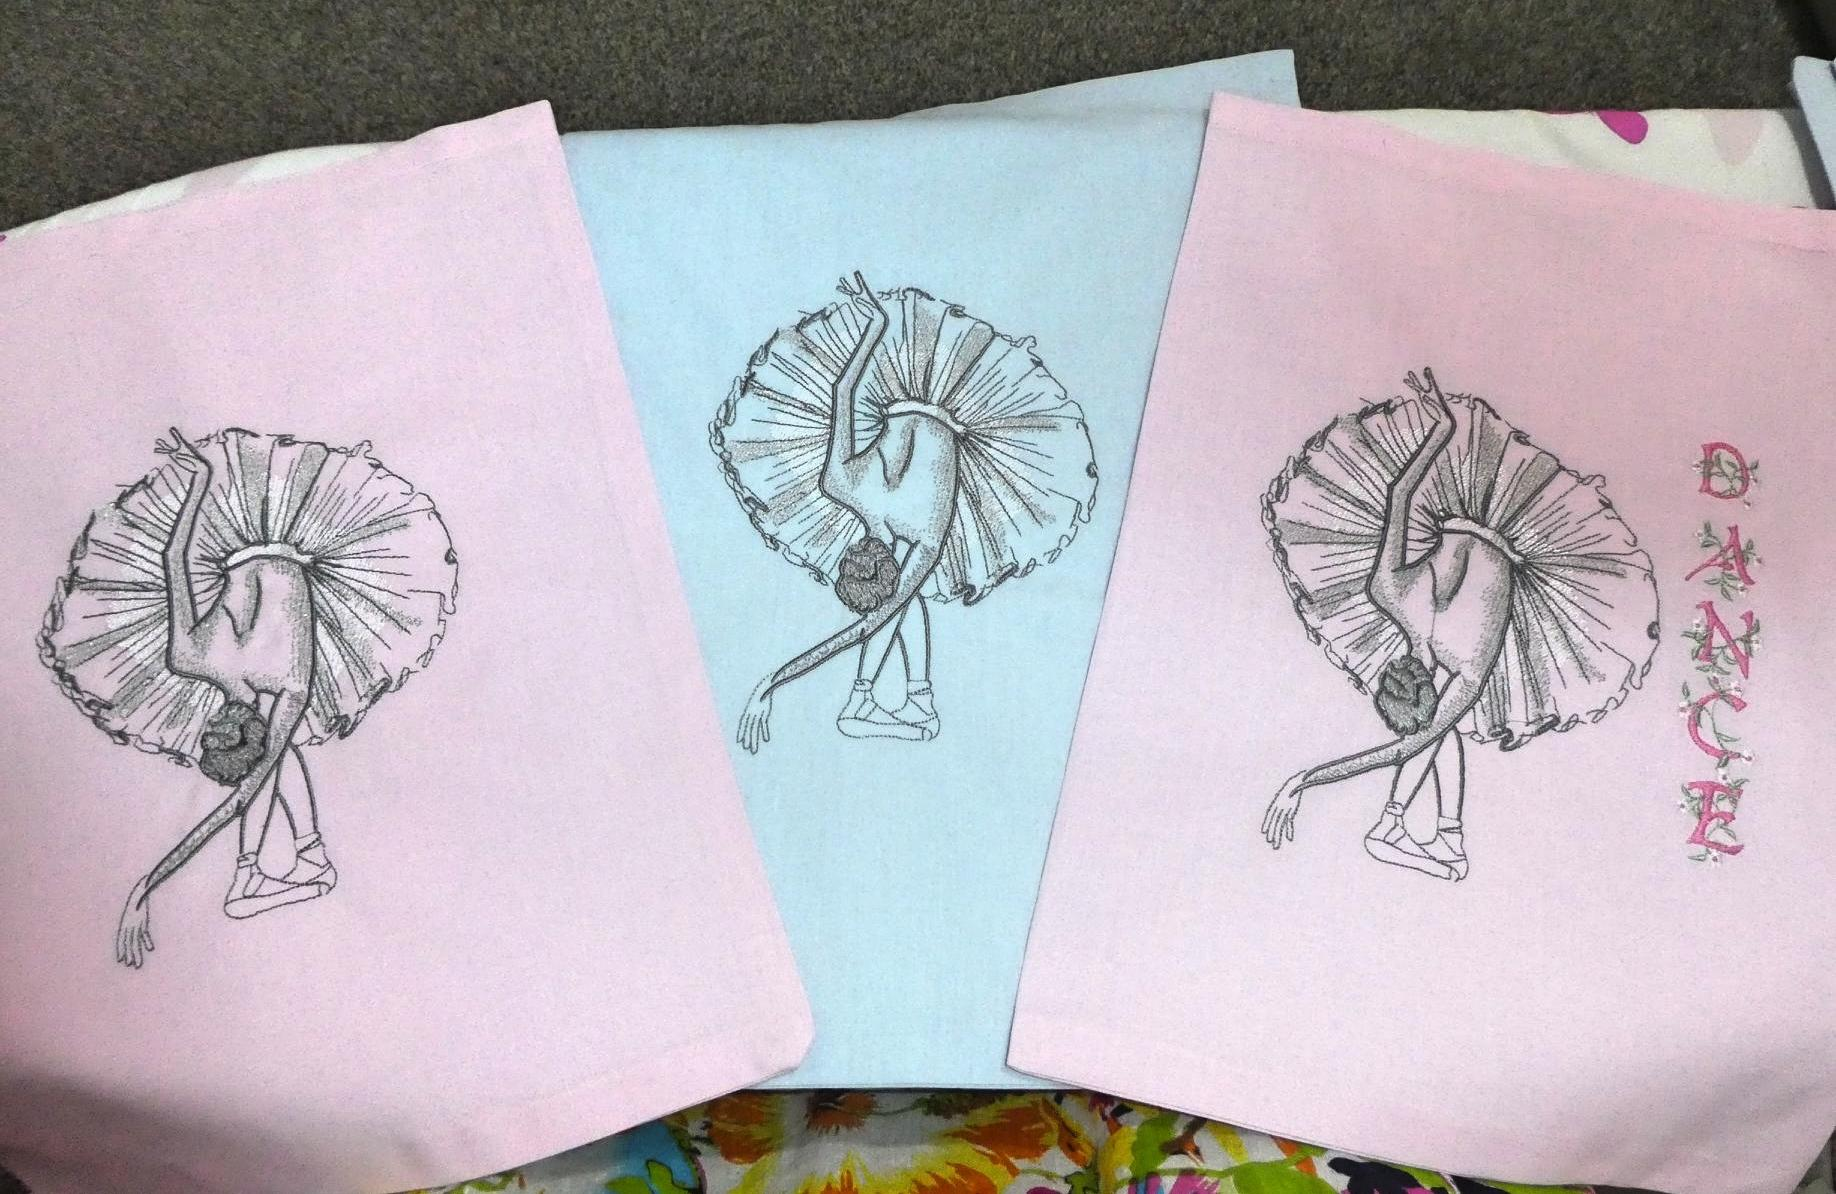 Set of embroidered handkerchief with Ballerina design